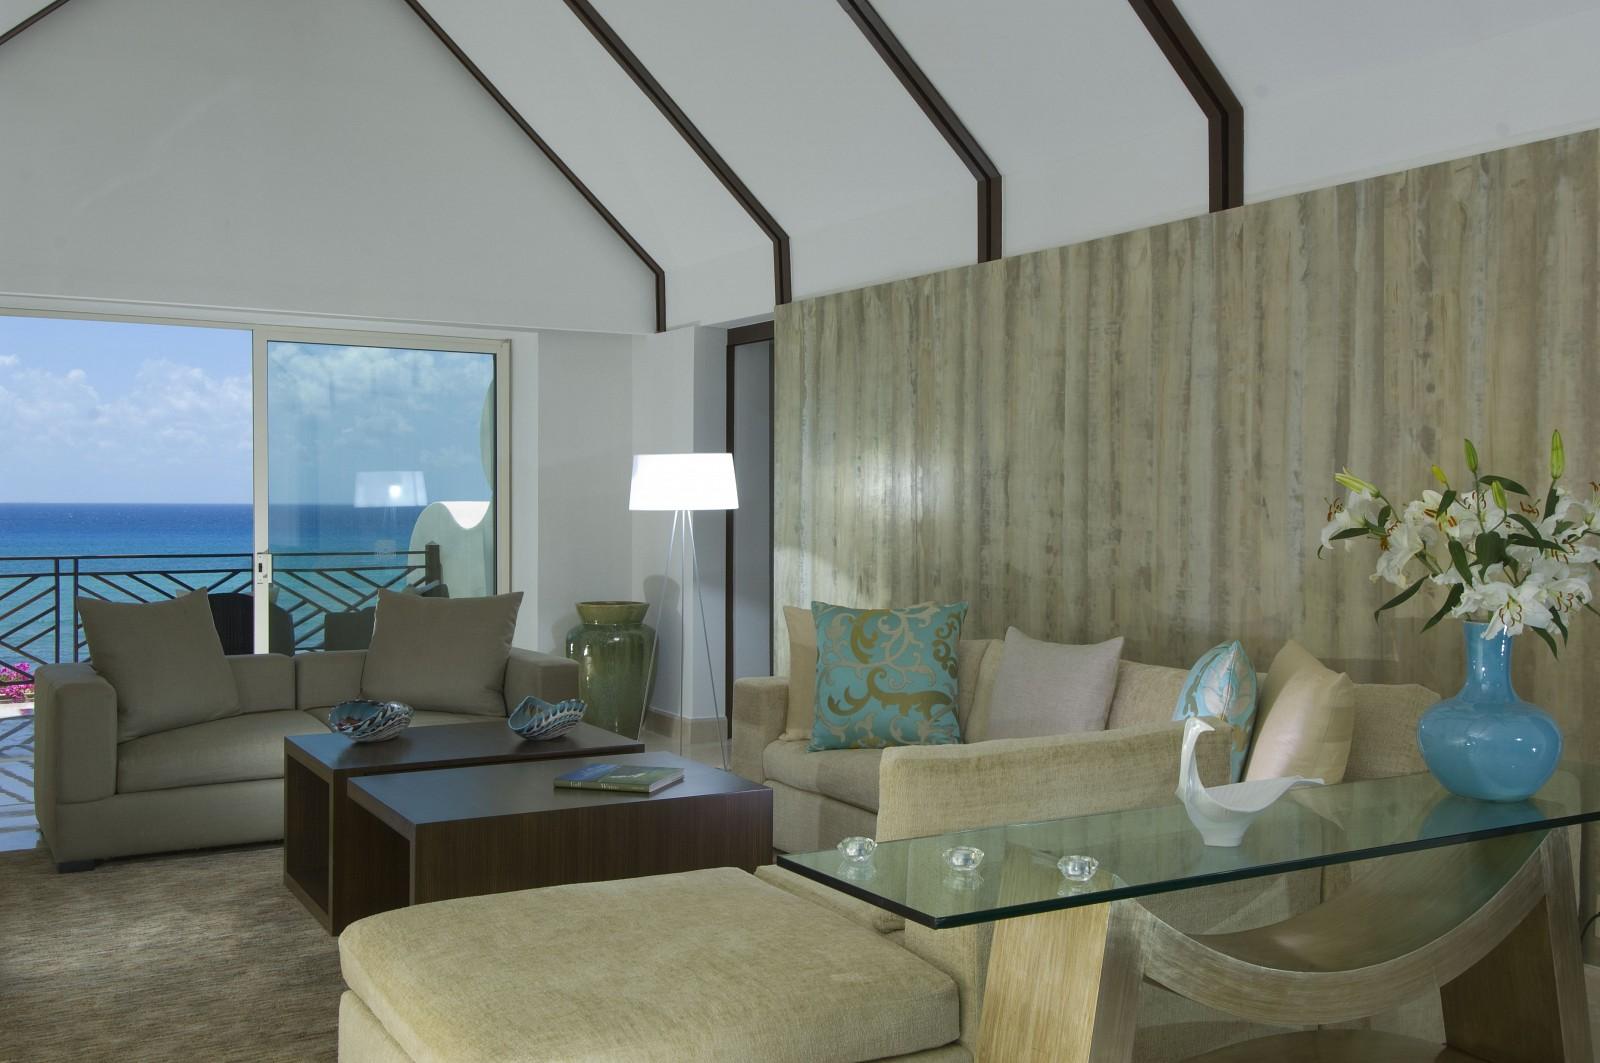 Travel Agency All-Inclusive Resort Grand Velas Riviera Maya 031